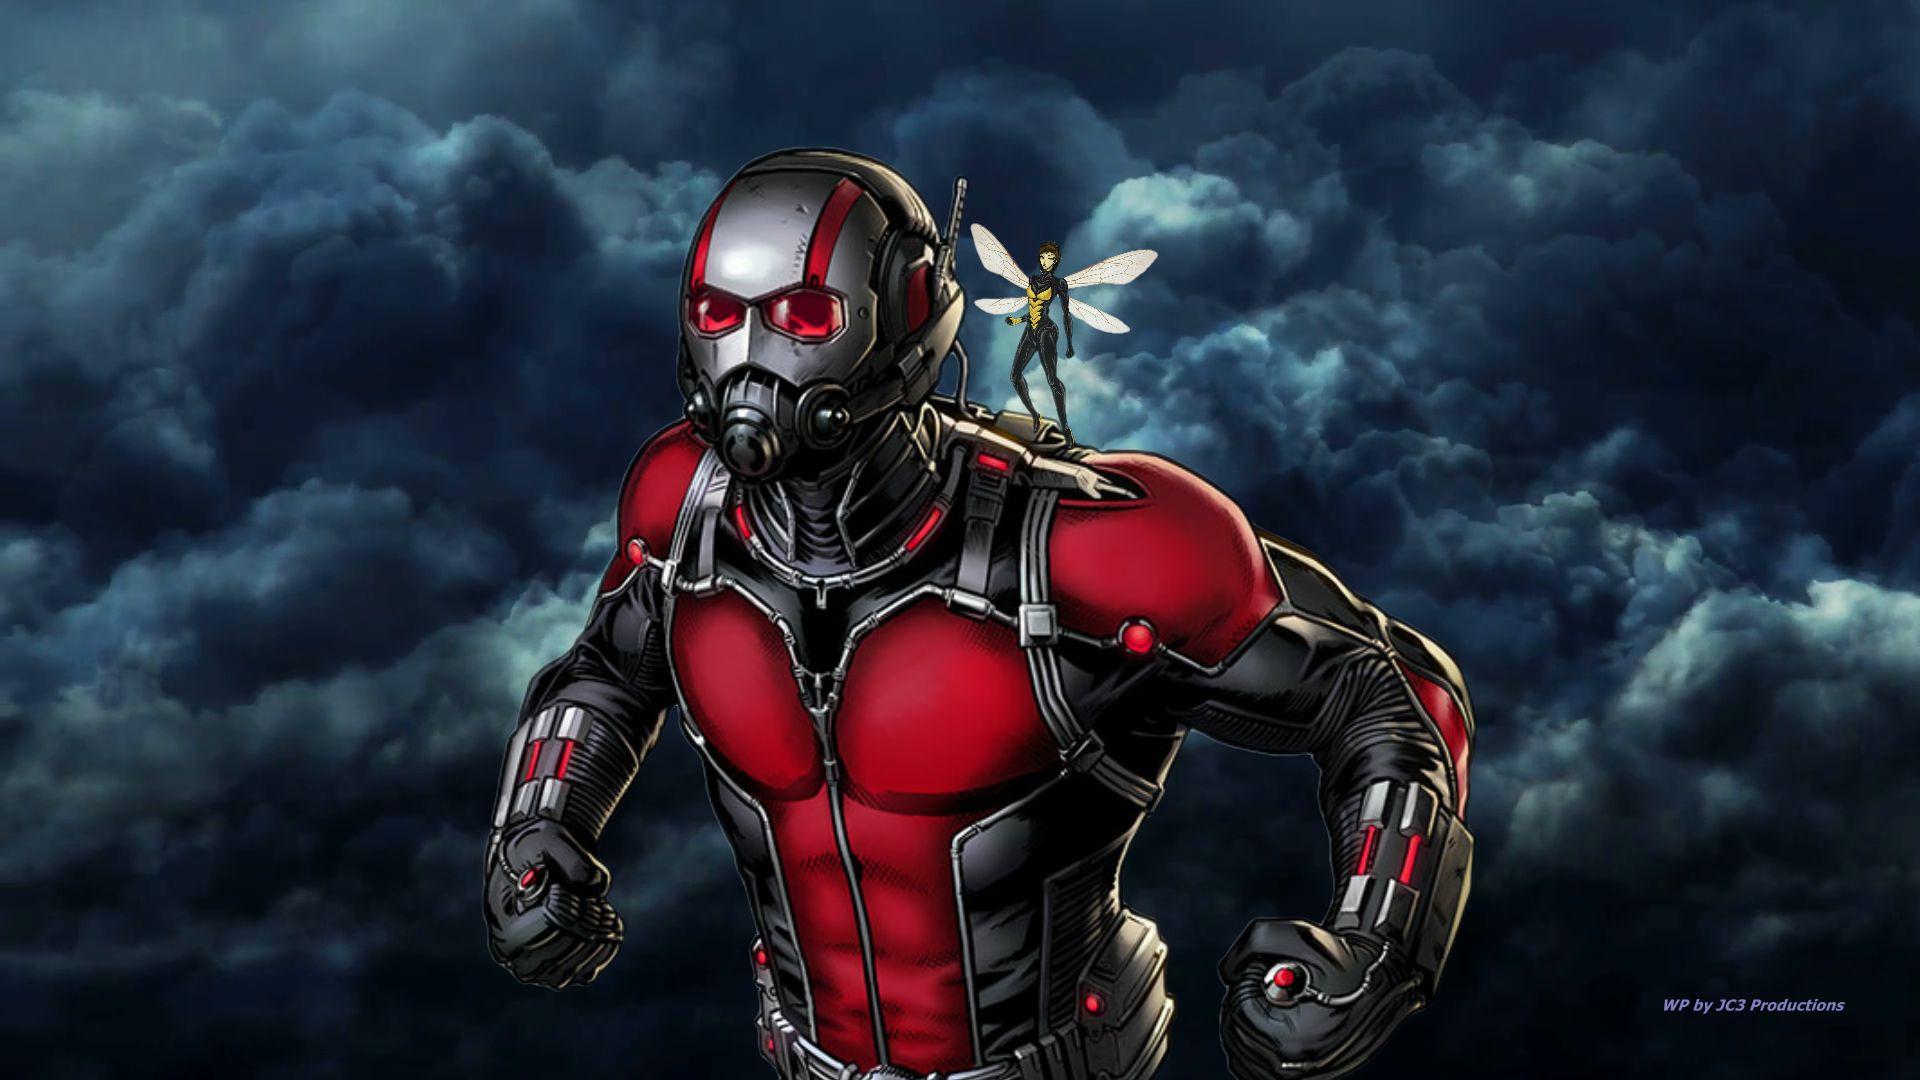 ANT MAN The हड्डा, ततैया 2